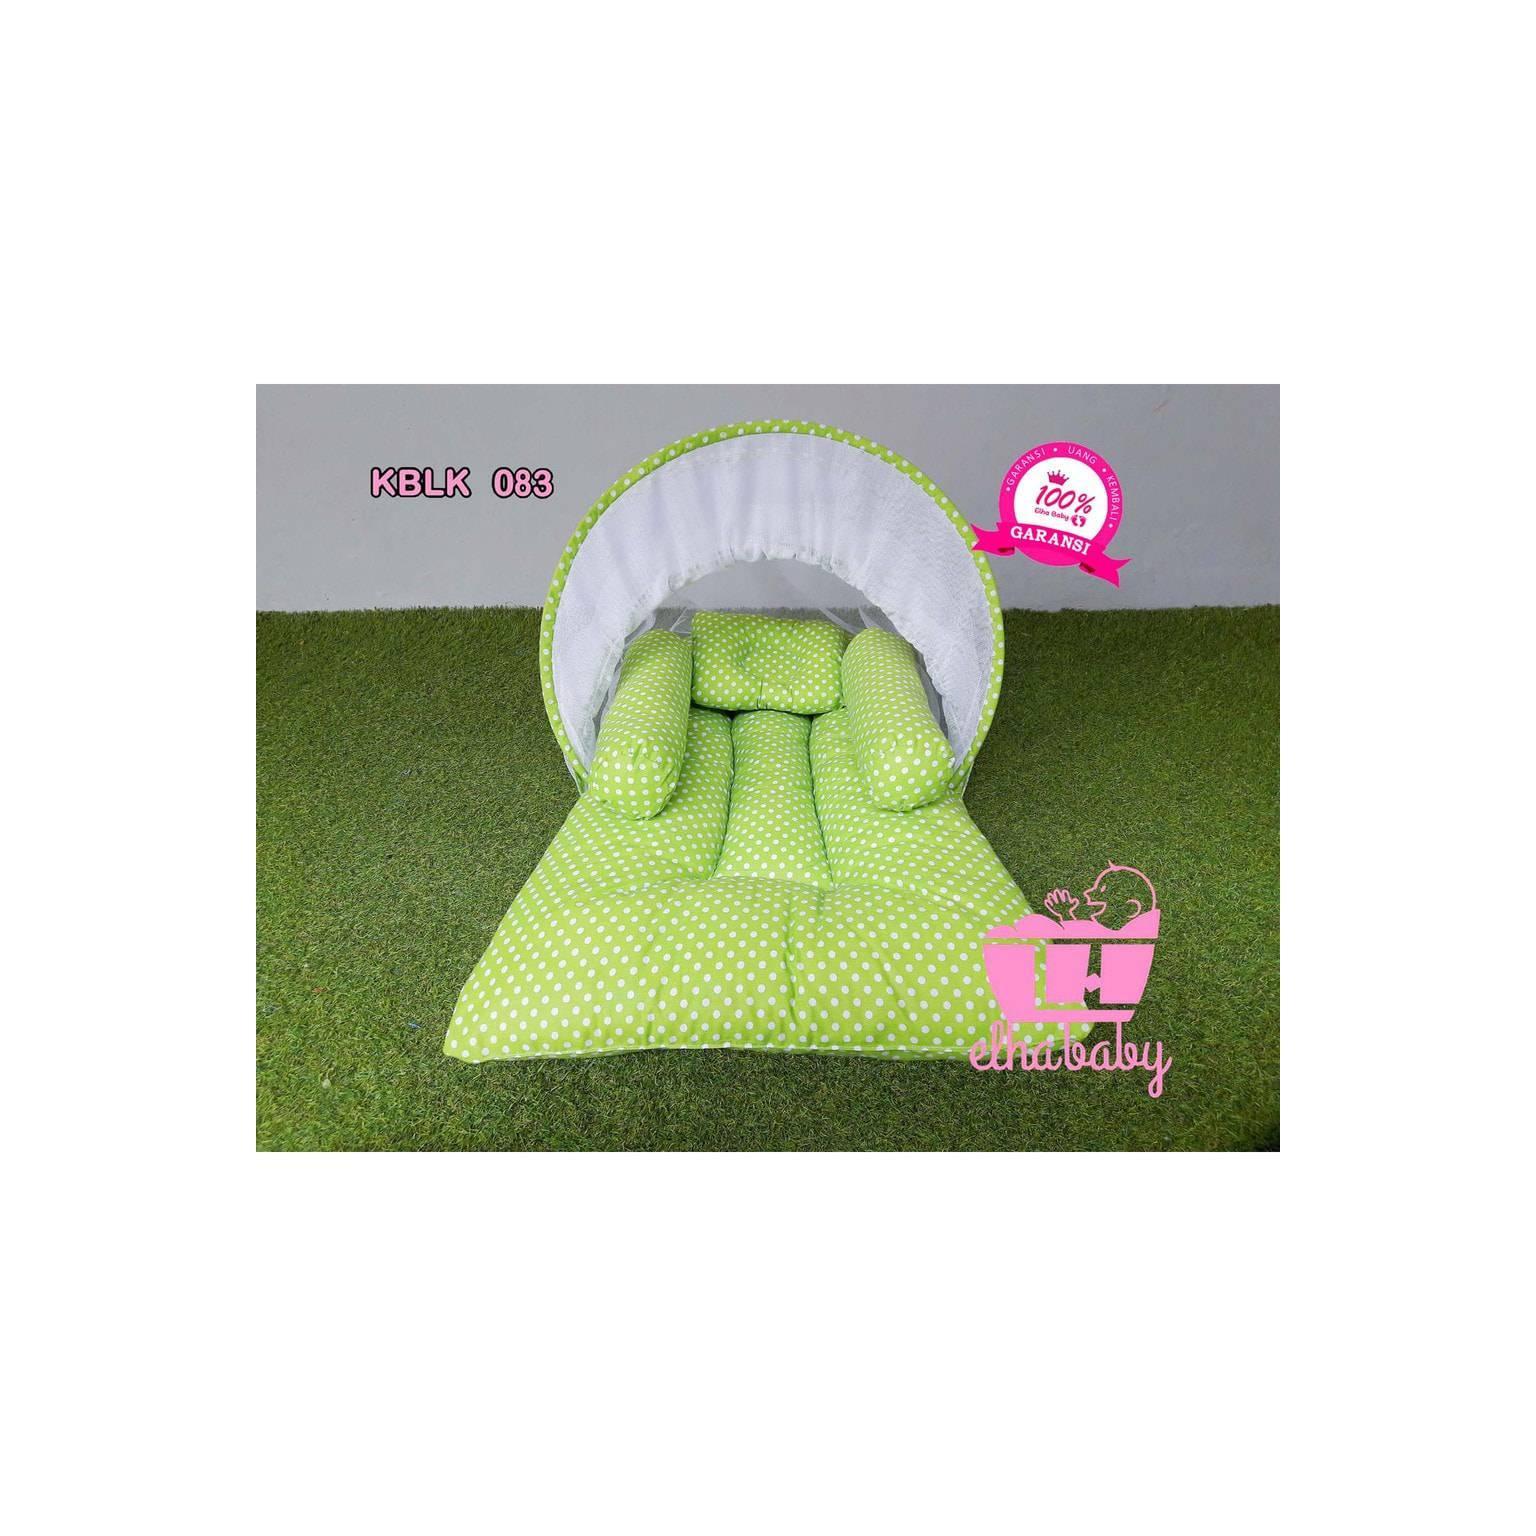 PROMO kasur bayi lipat Lucu Unik murah set kelambu motif Bonus Tas |